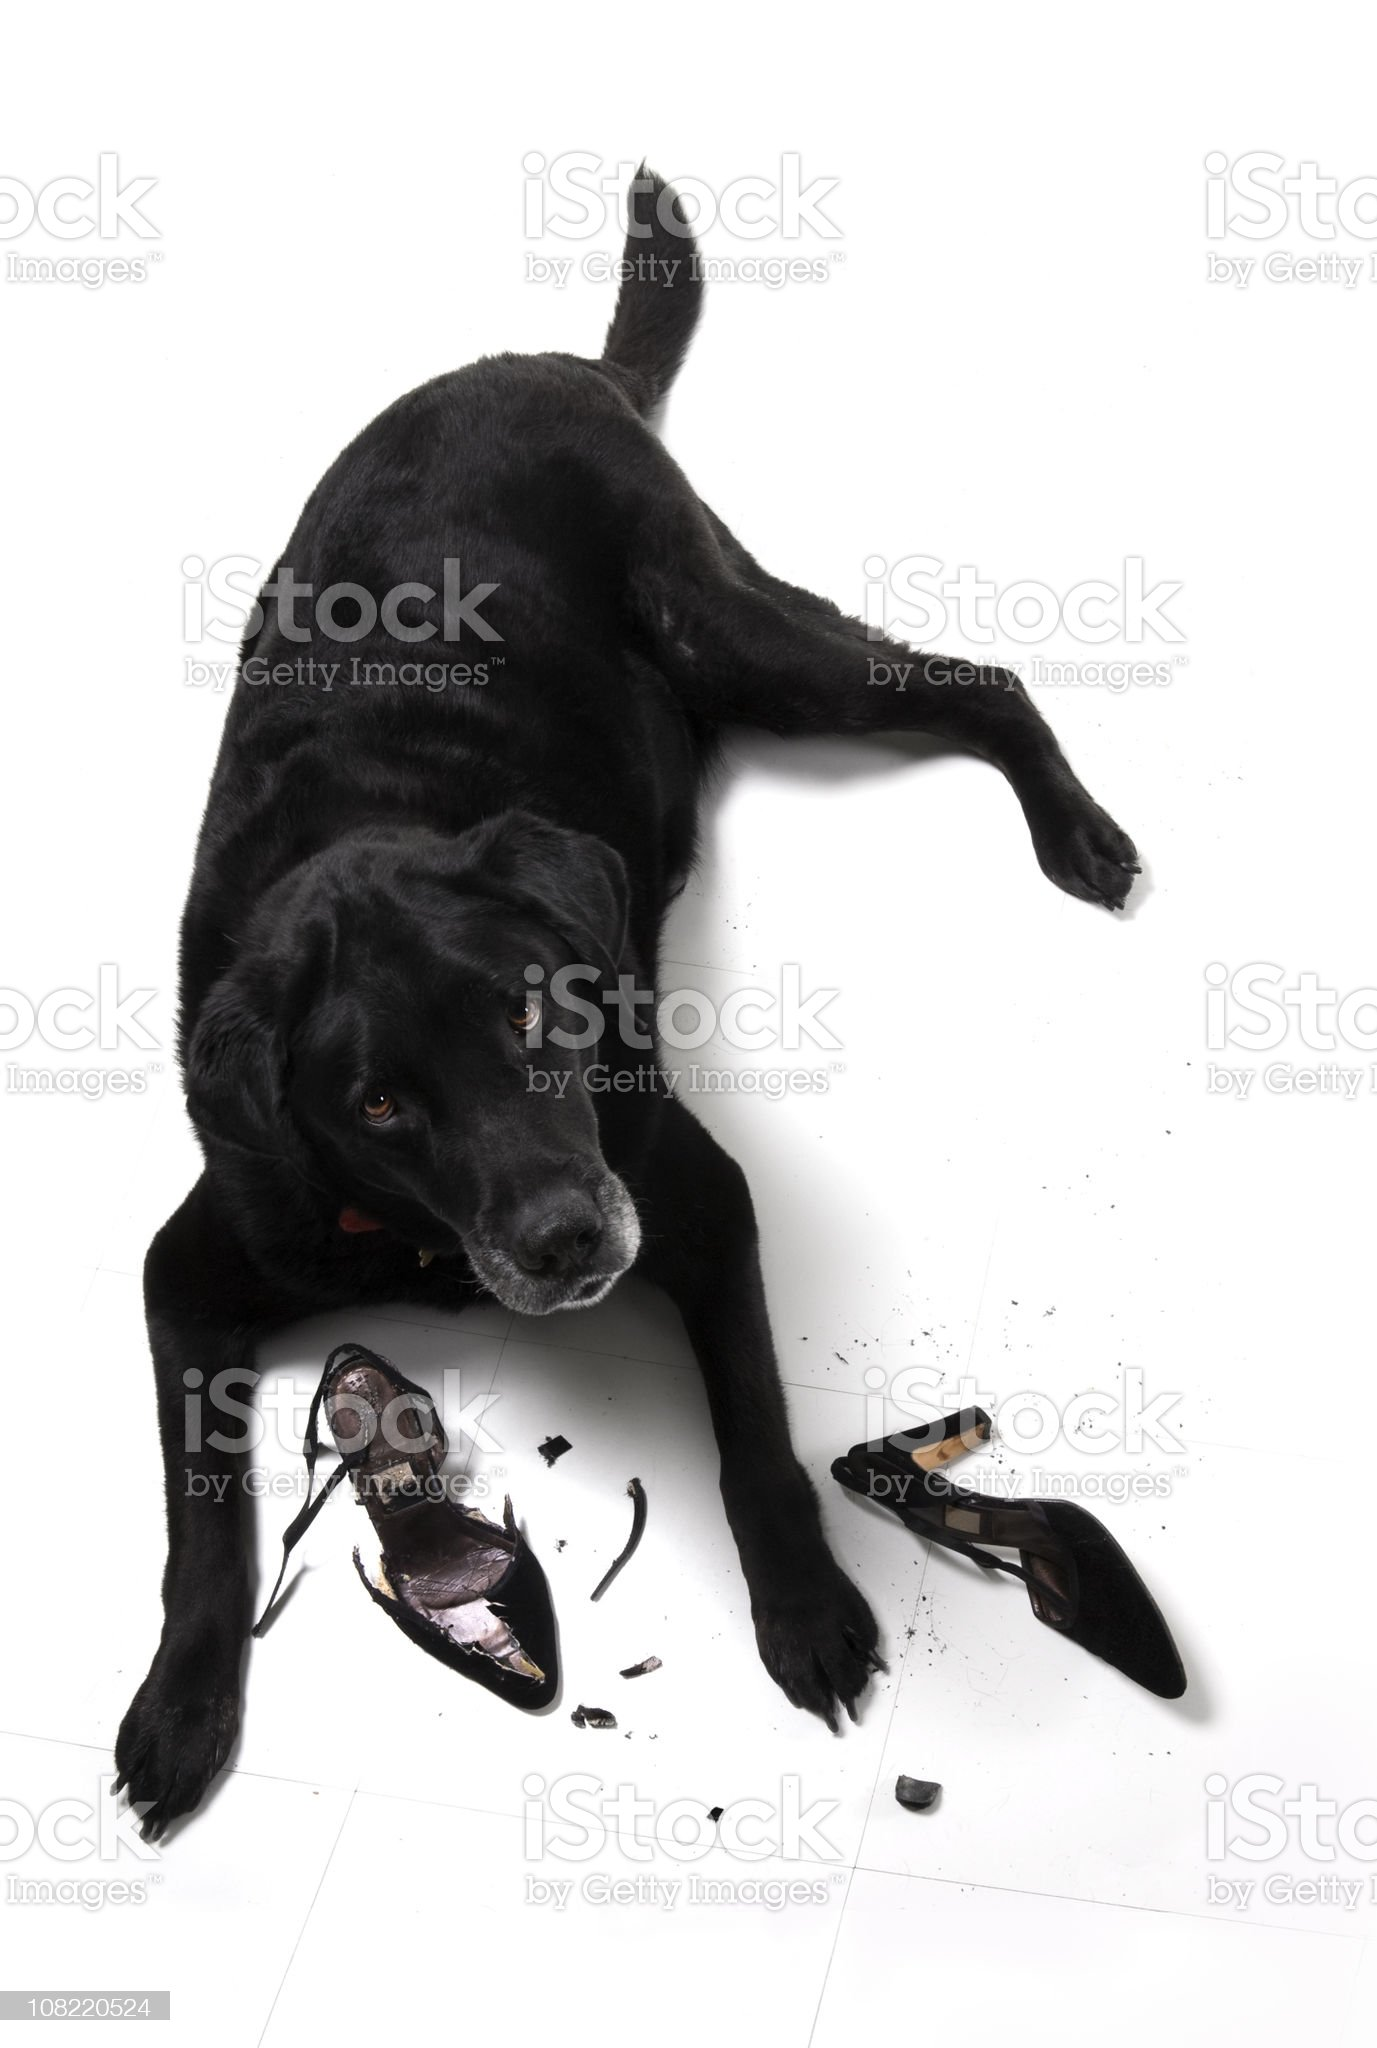 Black Labrador Retriever Dog with Demolished High Heel Shoes royalty-free stock photo